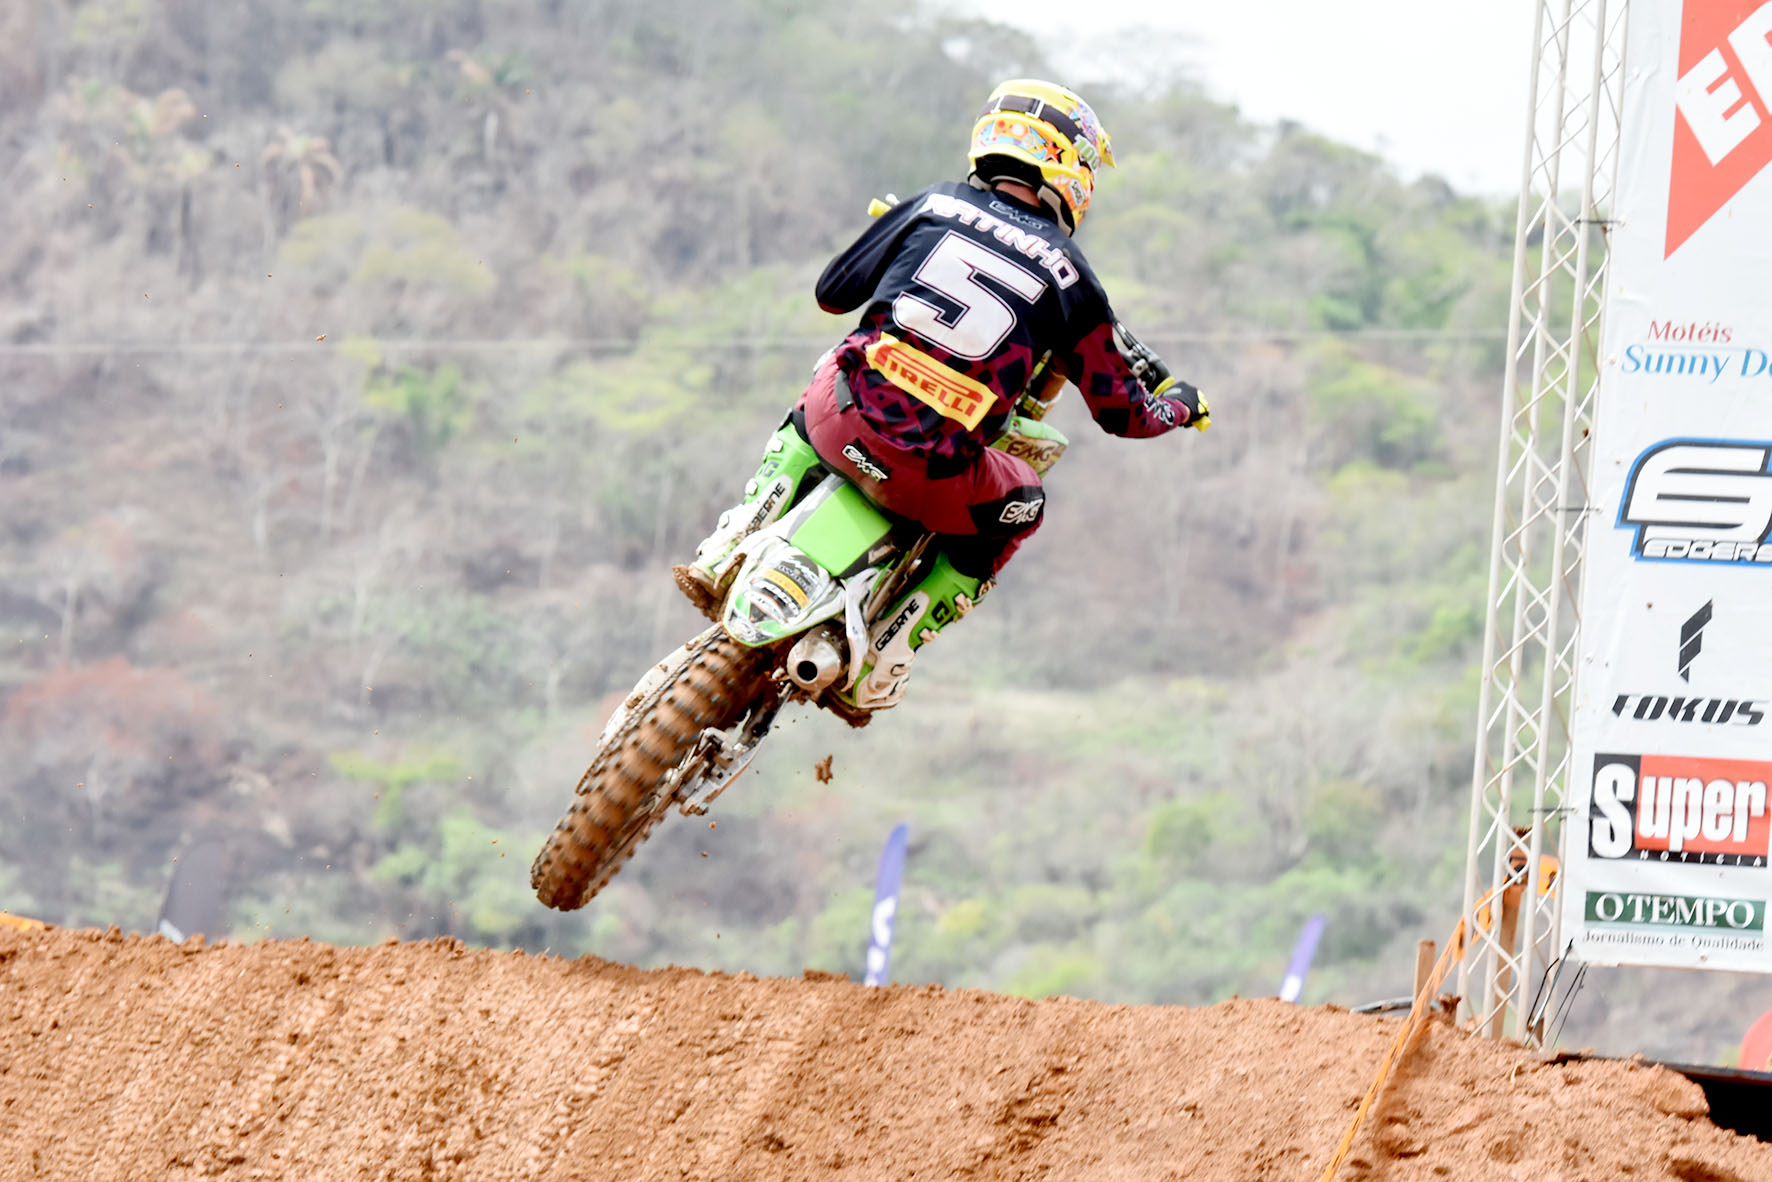 Motocross pgina 12 foto fandeluxe Image collections